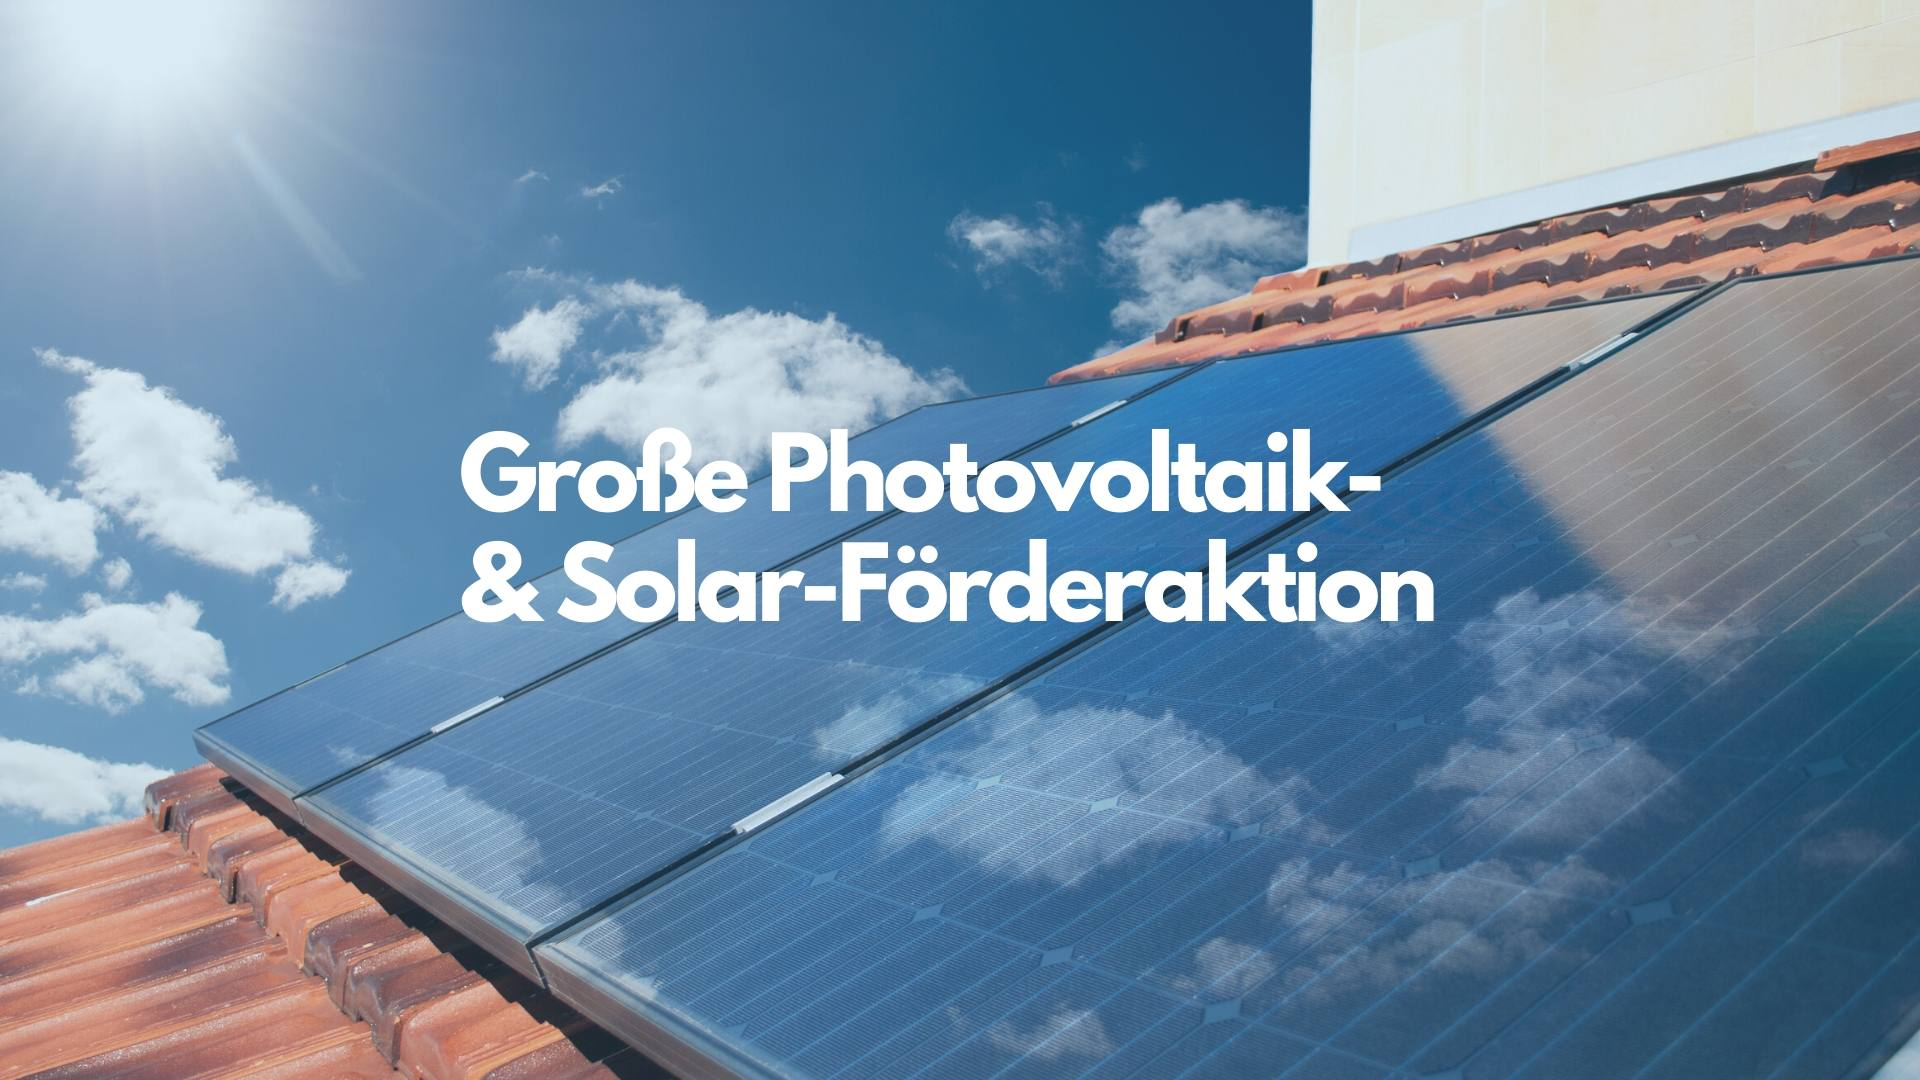 Große Photovoltaik Förderung